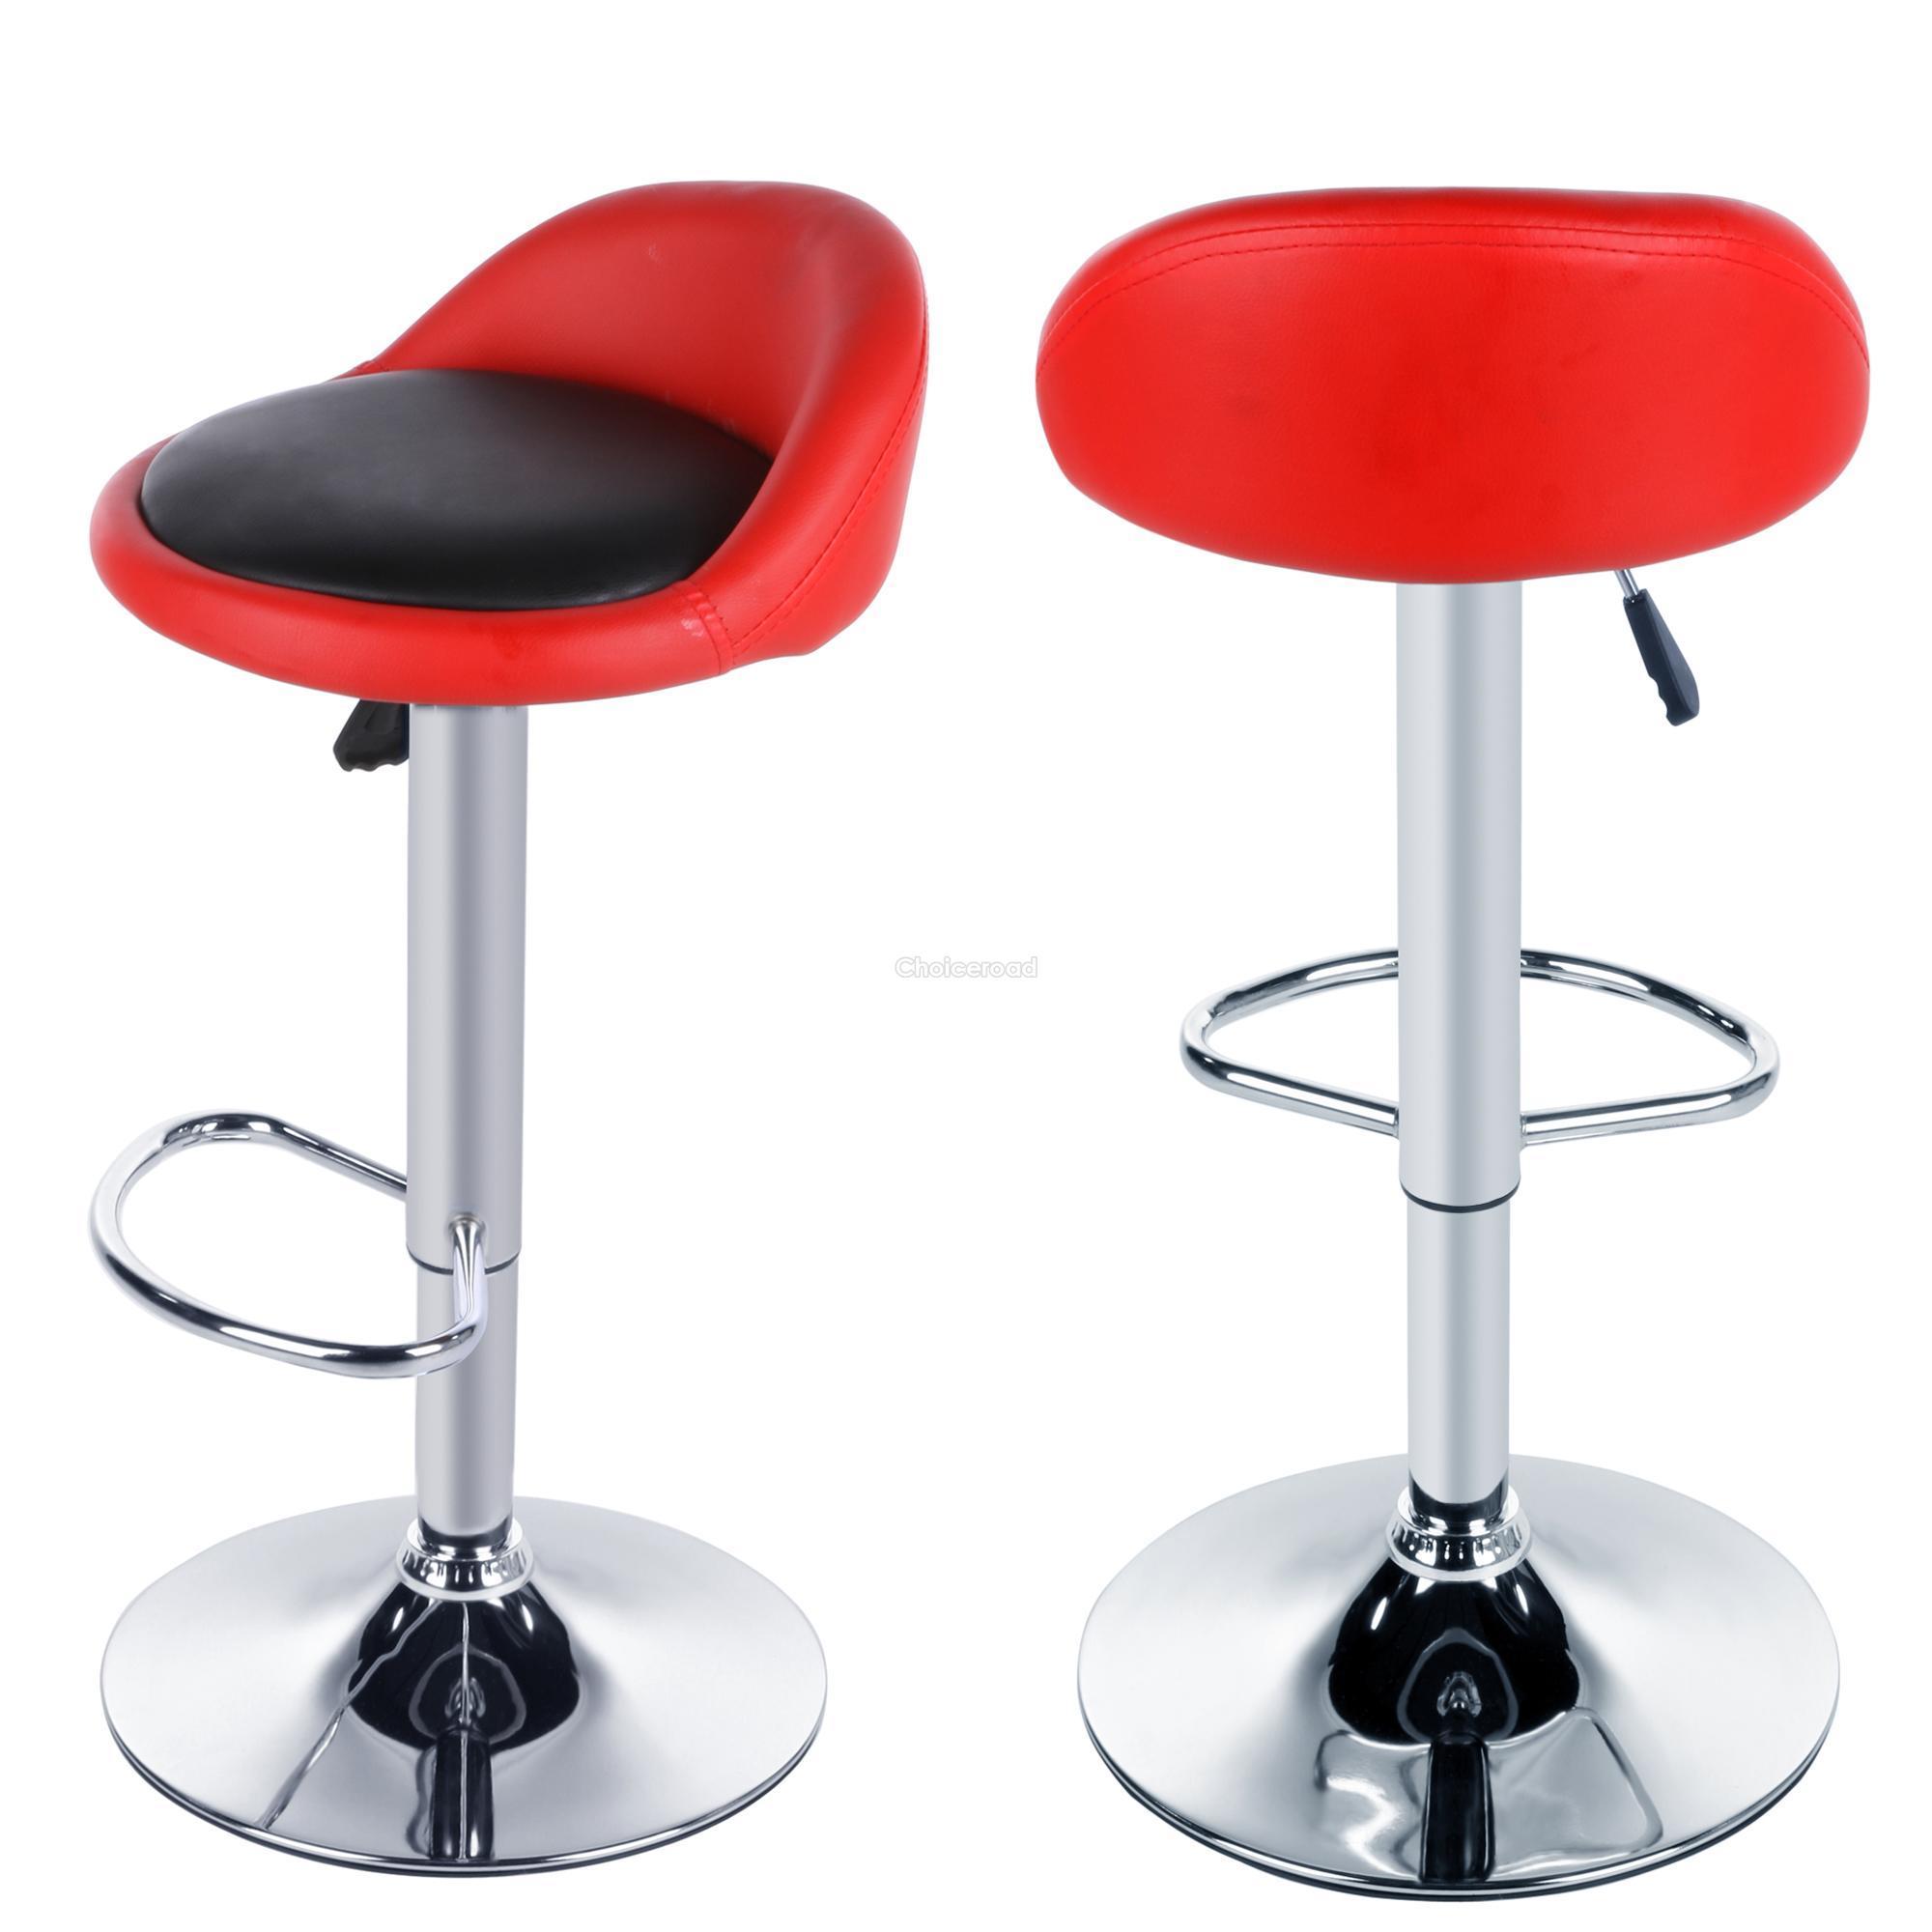 Homdox 2x Adjustable Height Rotating Bar Stool Dinning